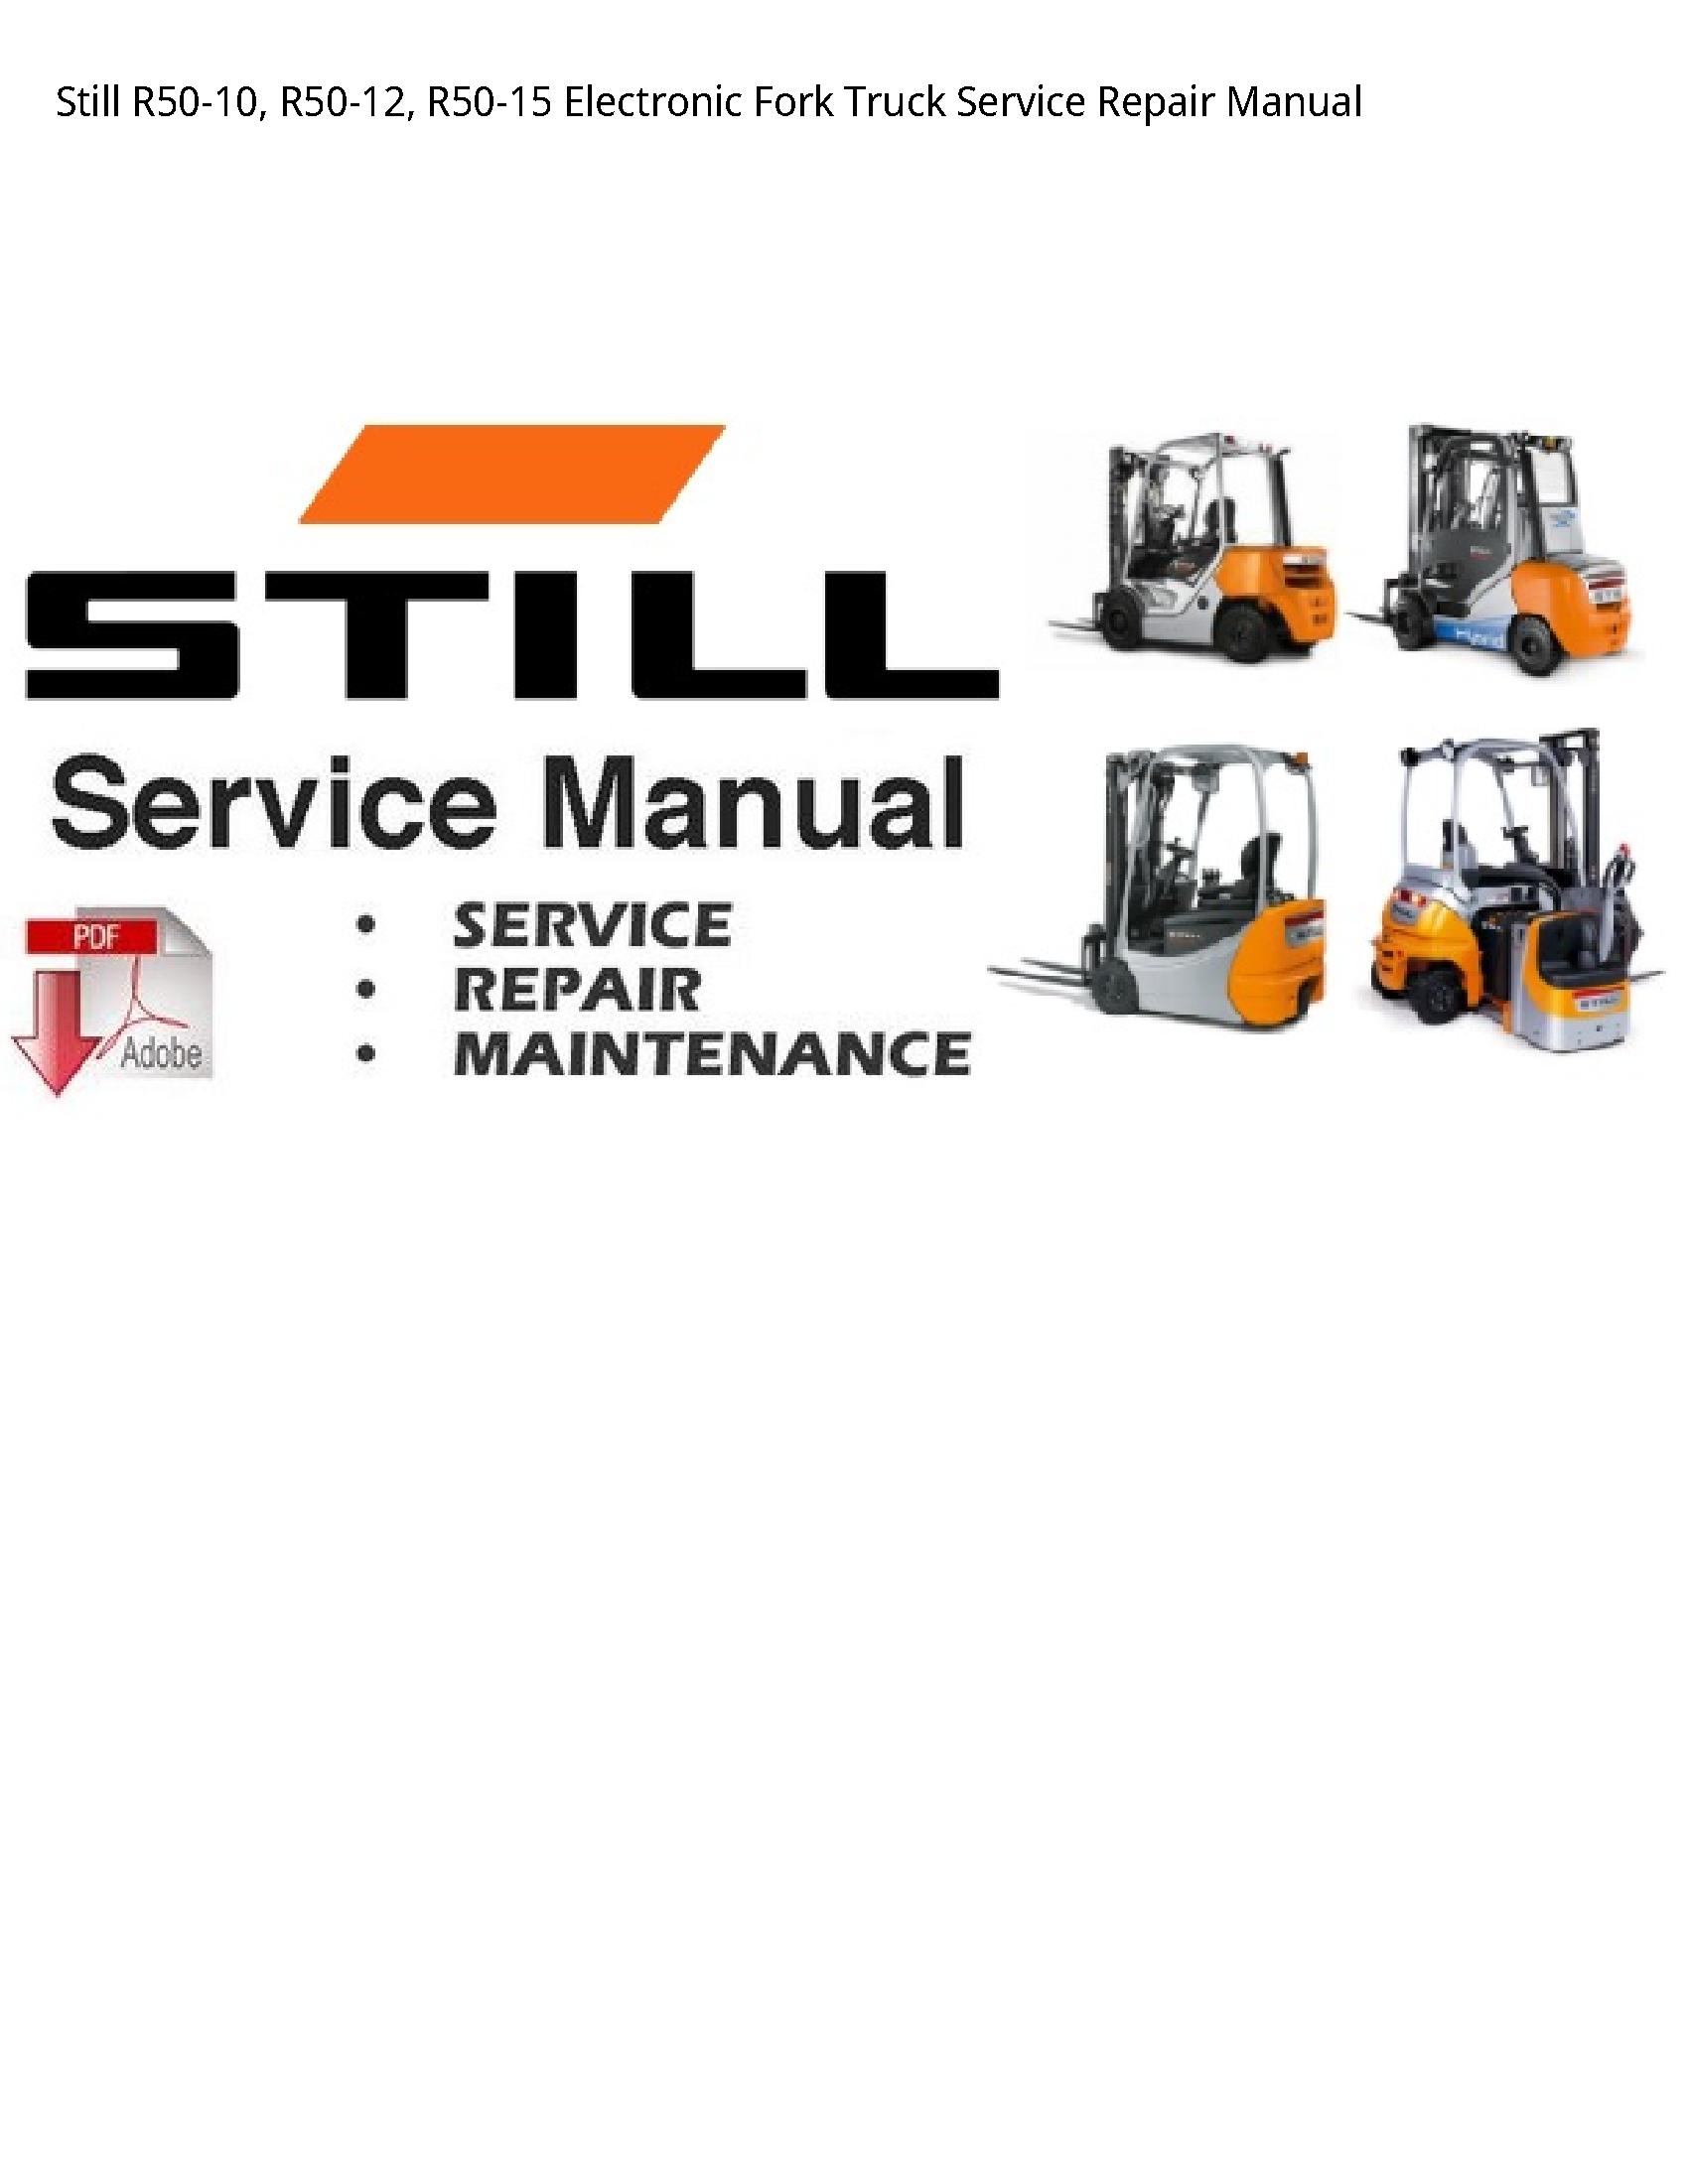 Still R50-10 Electronic Fork Truck manual